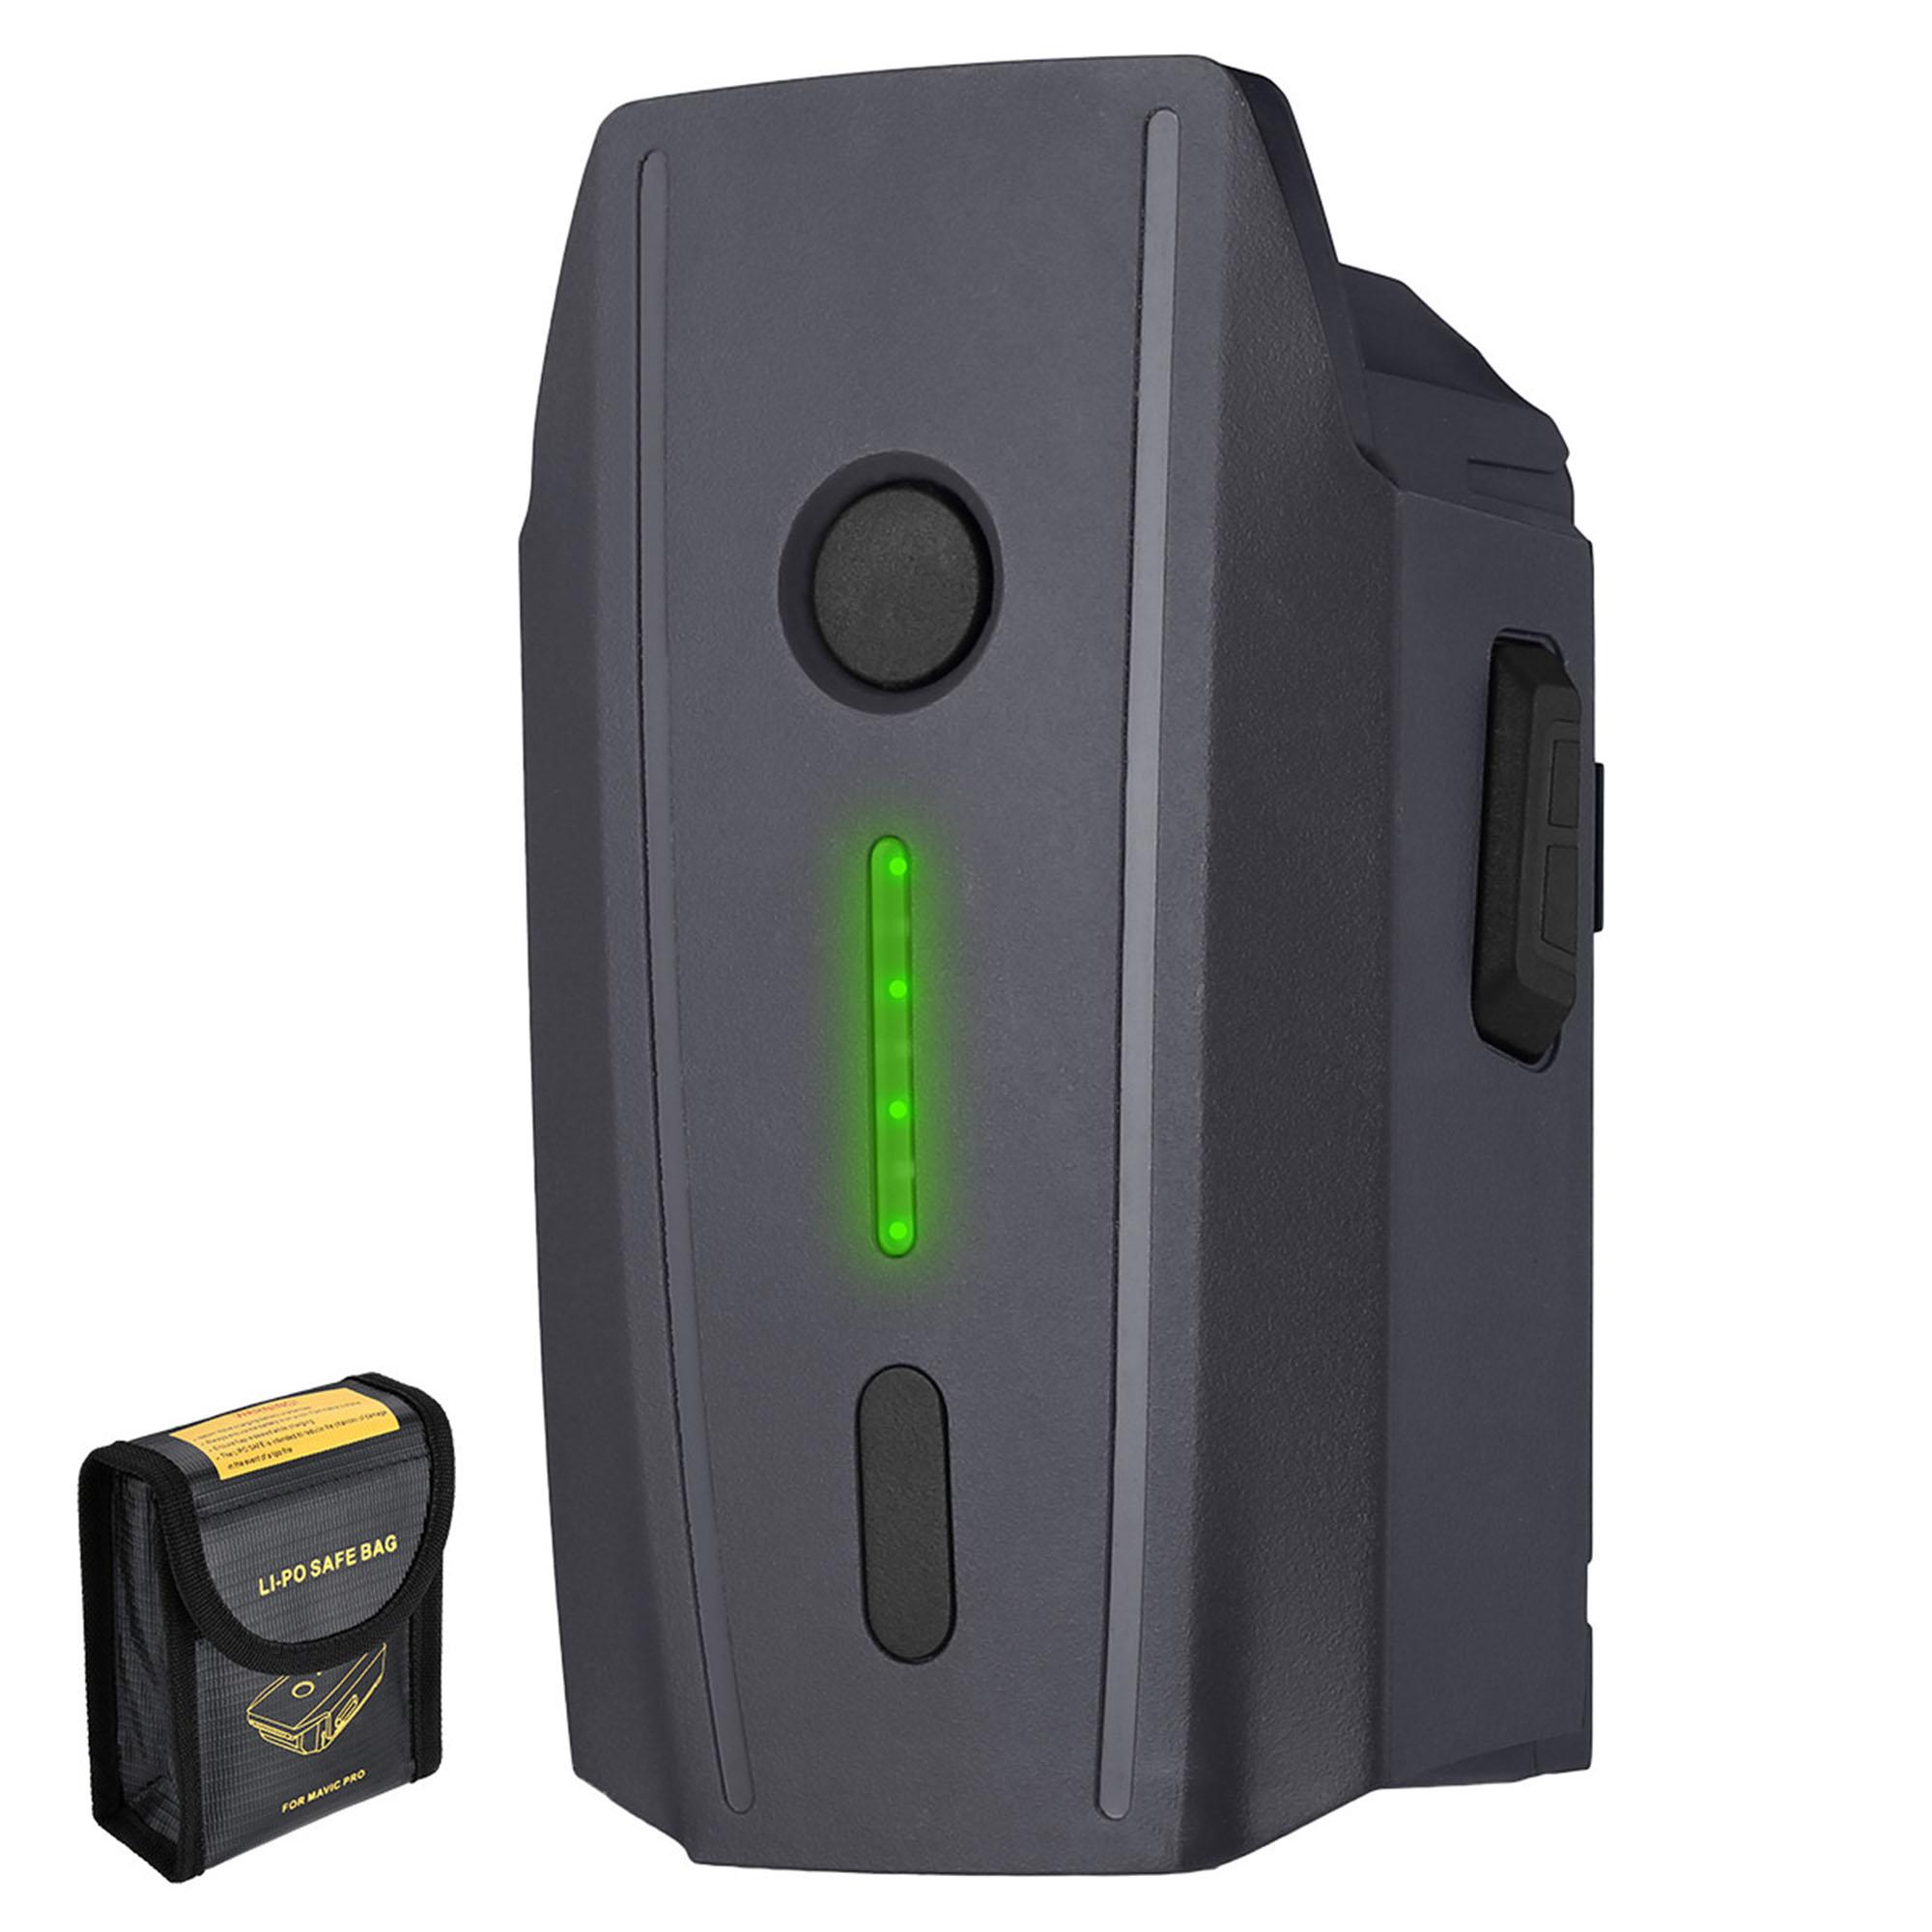 Powerextra Mavic Pro Battery 11.4V 3830mAh LiPo Intelligent Flight Battery for DJI Mavic Pro & Platinum & Alpine White Drone